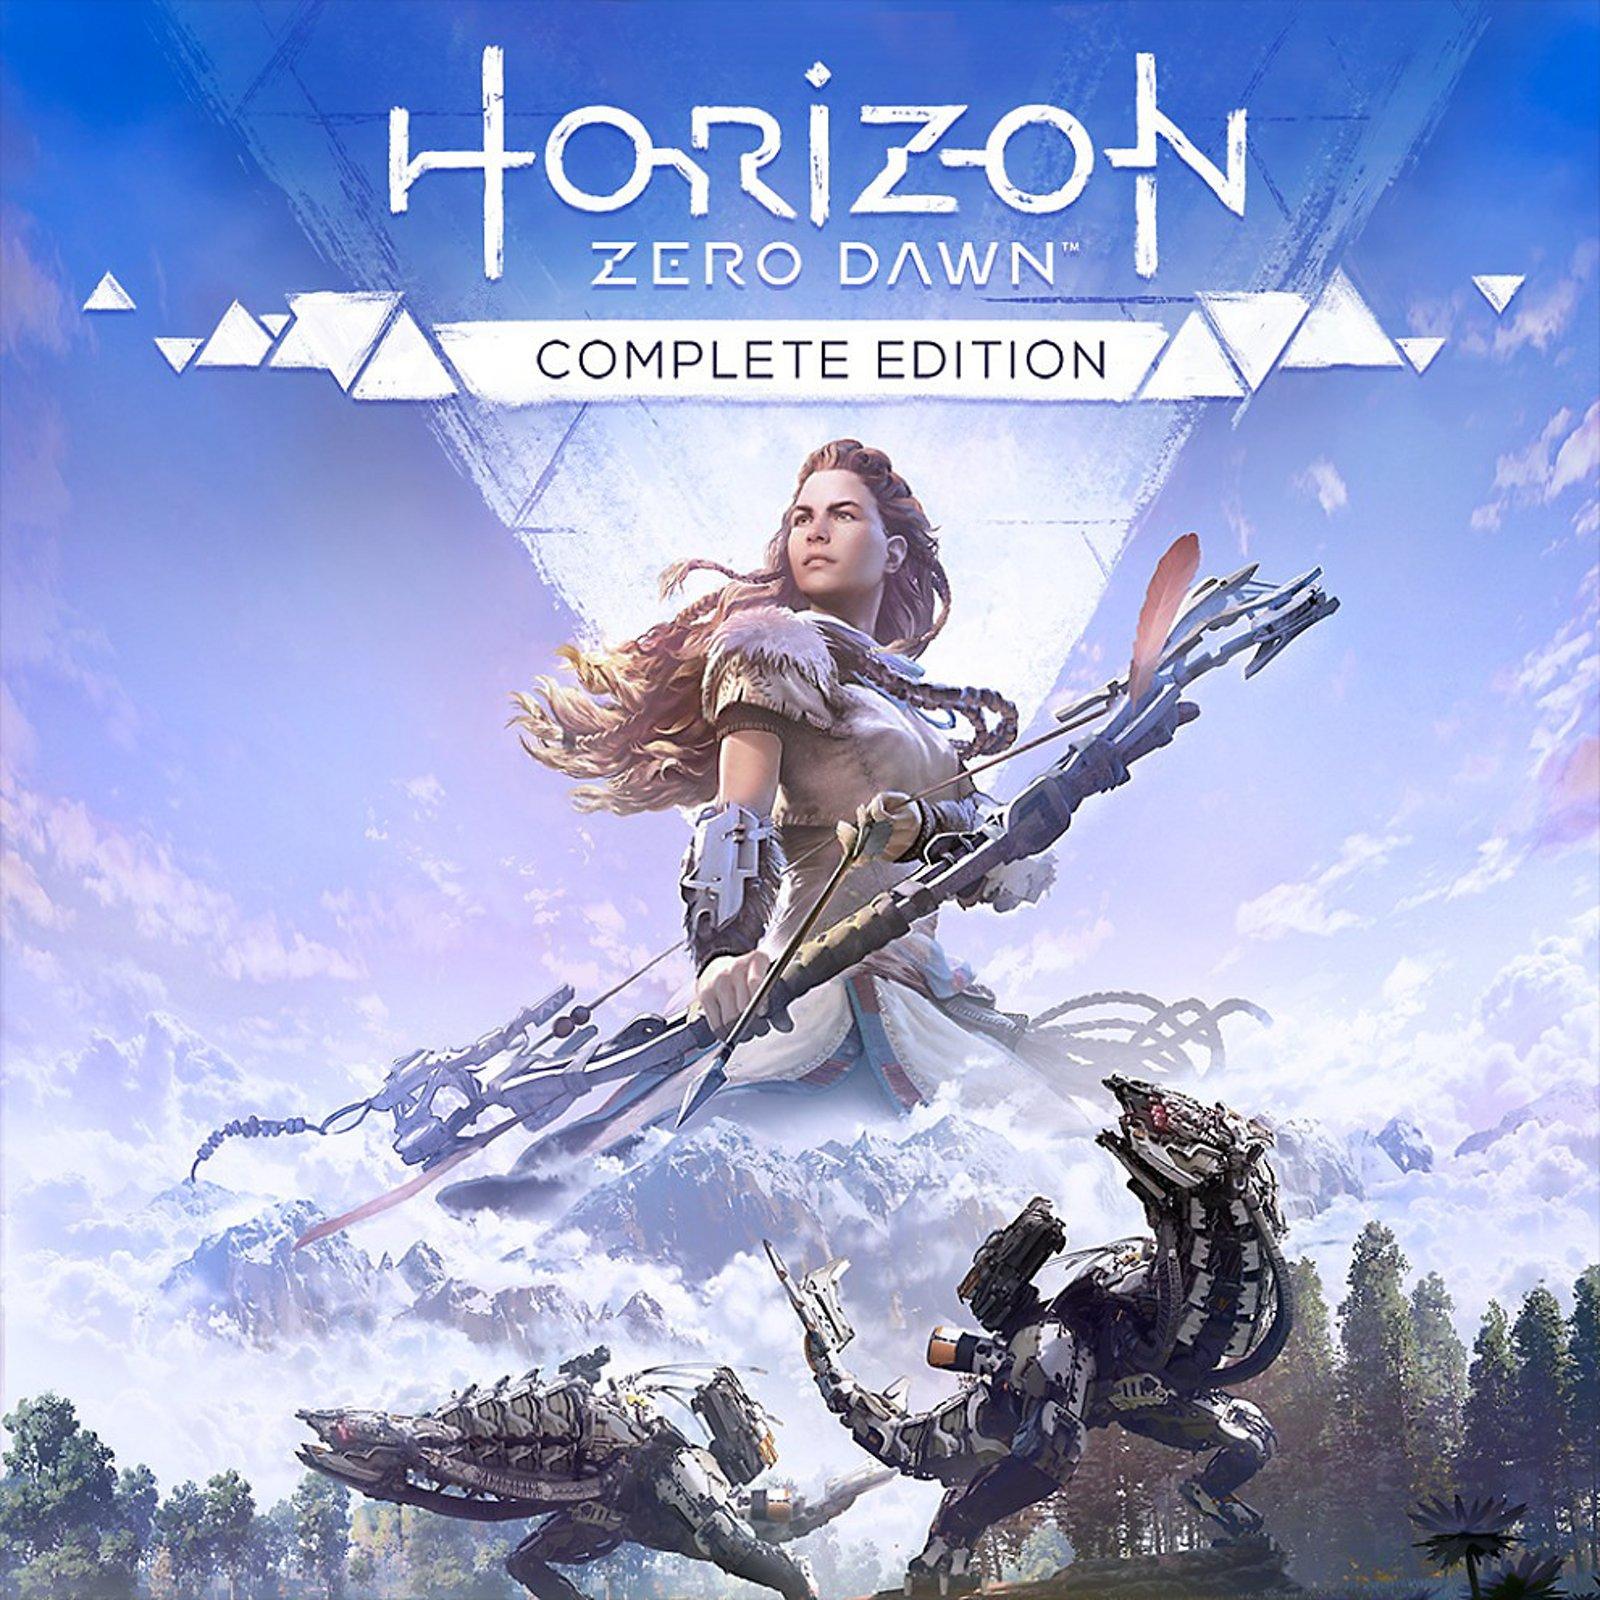 horizon-zero-dawn-key-art-01-ps4.jpg